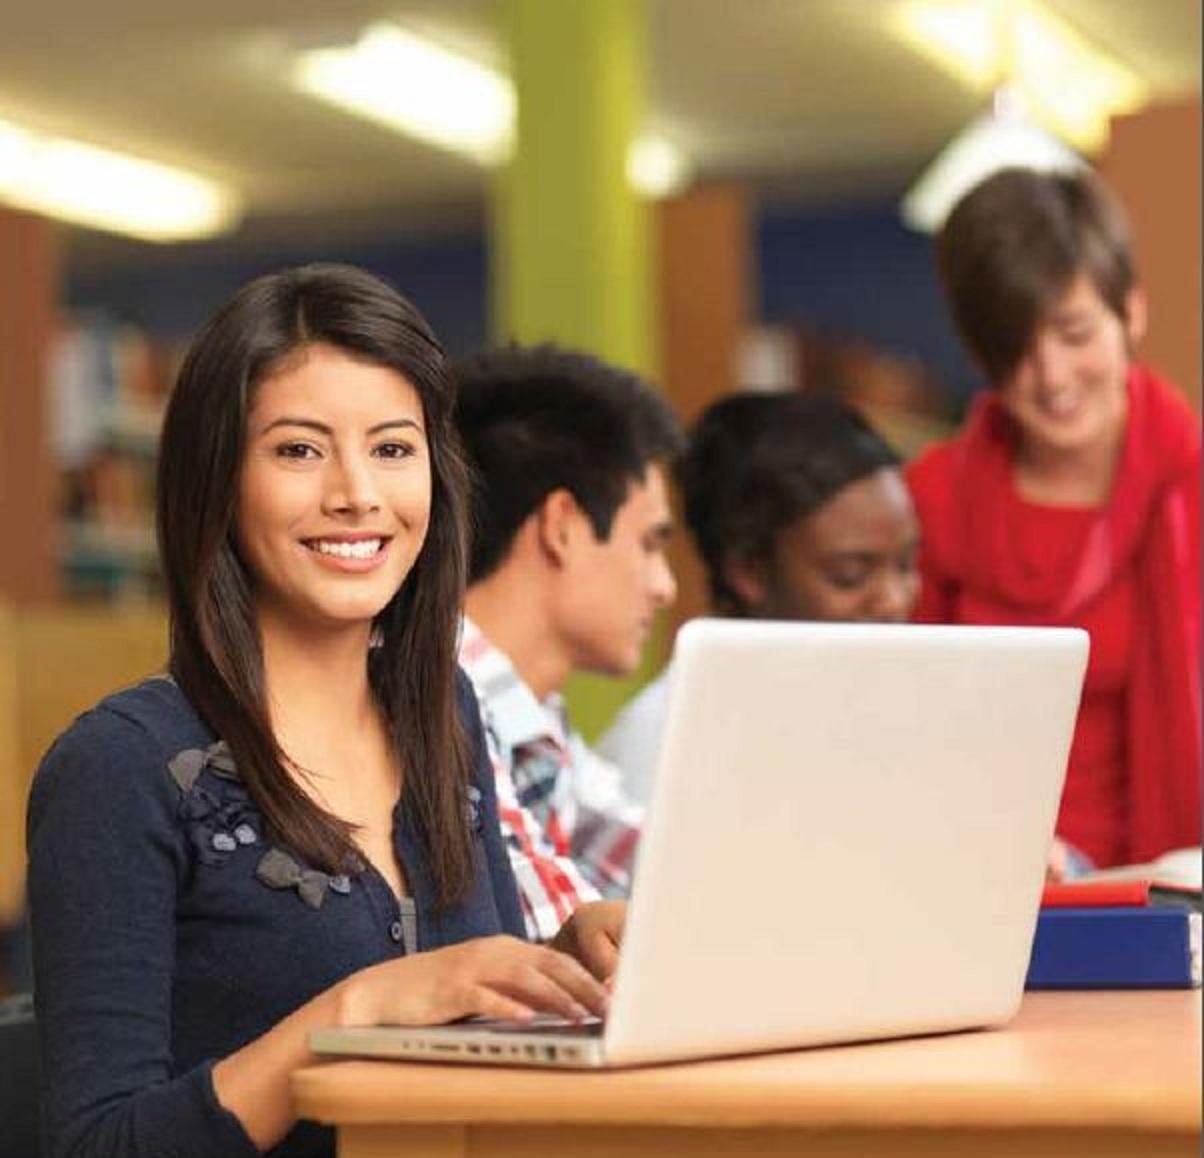 mirvac graduate traineeship program pdf